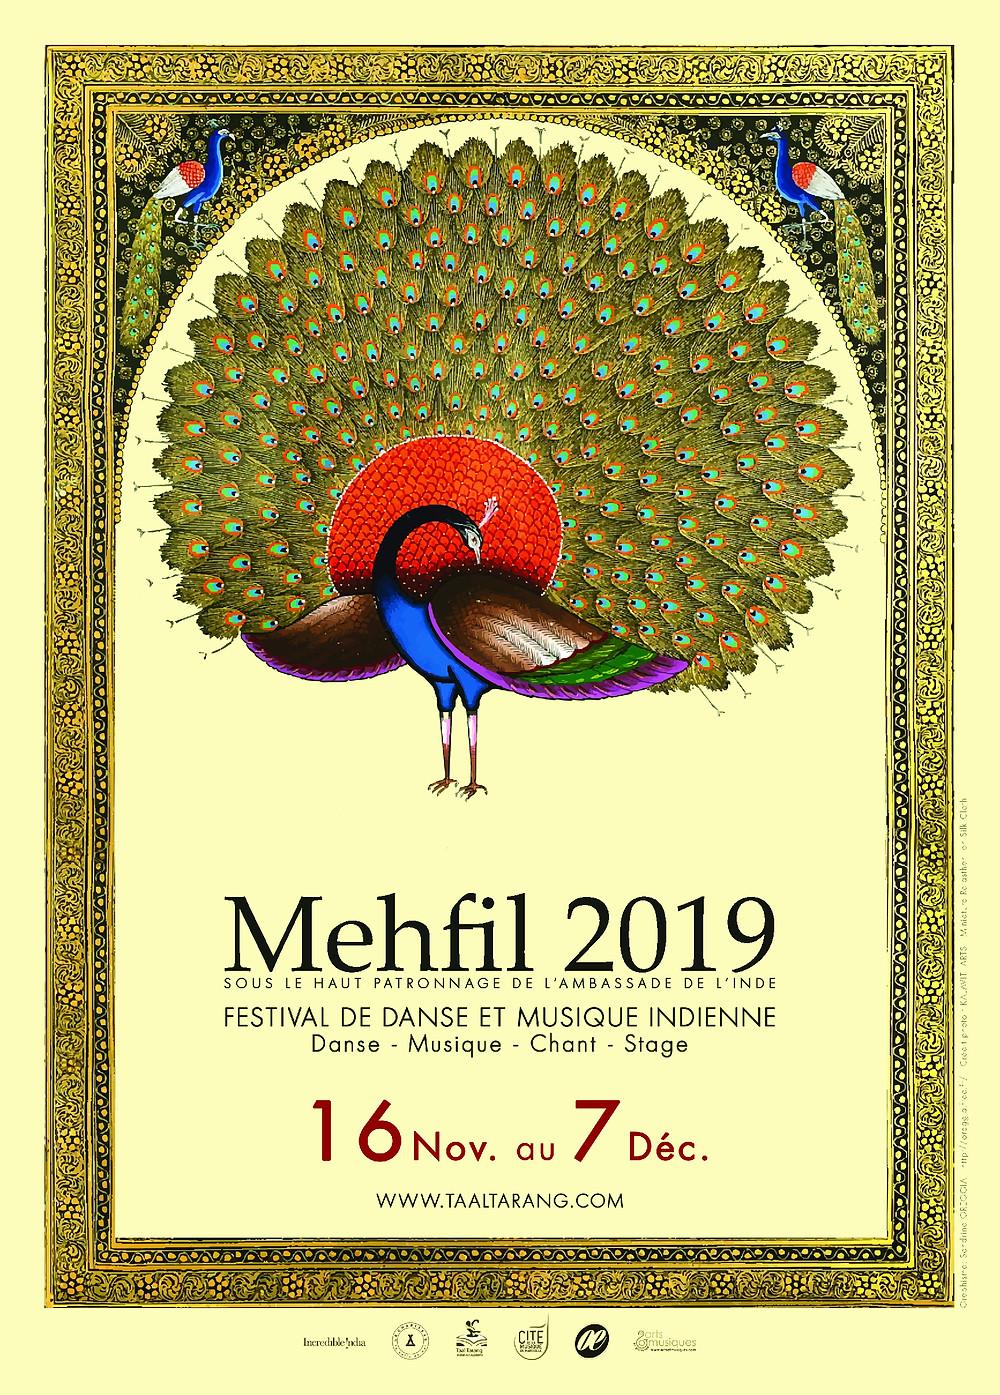 https://www.taaltarang.com/festival/mehfil-2019/